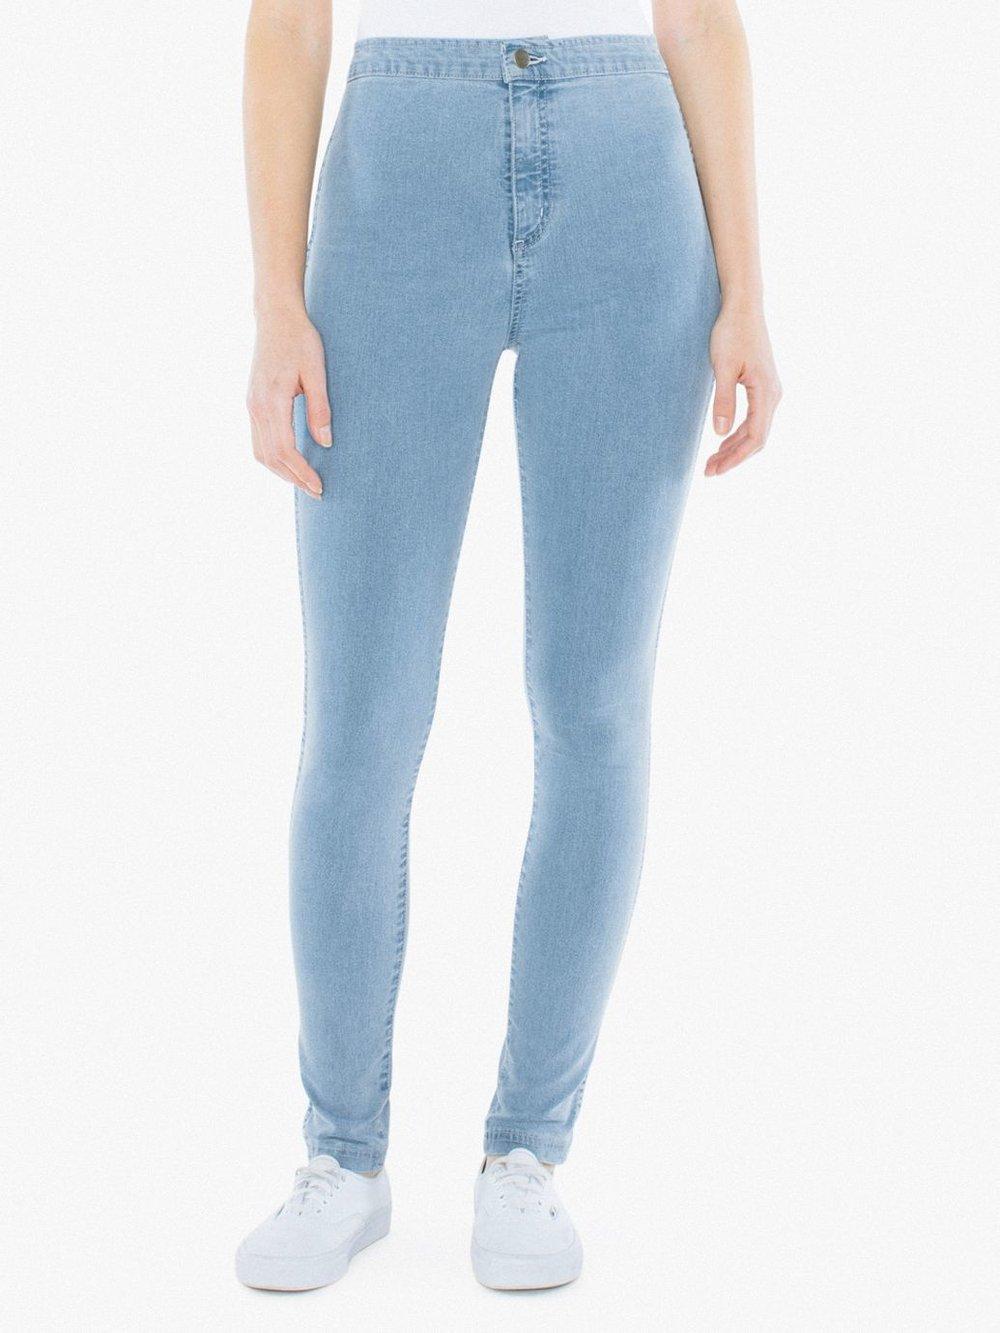 Easy Jean